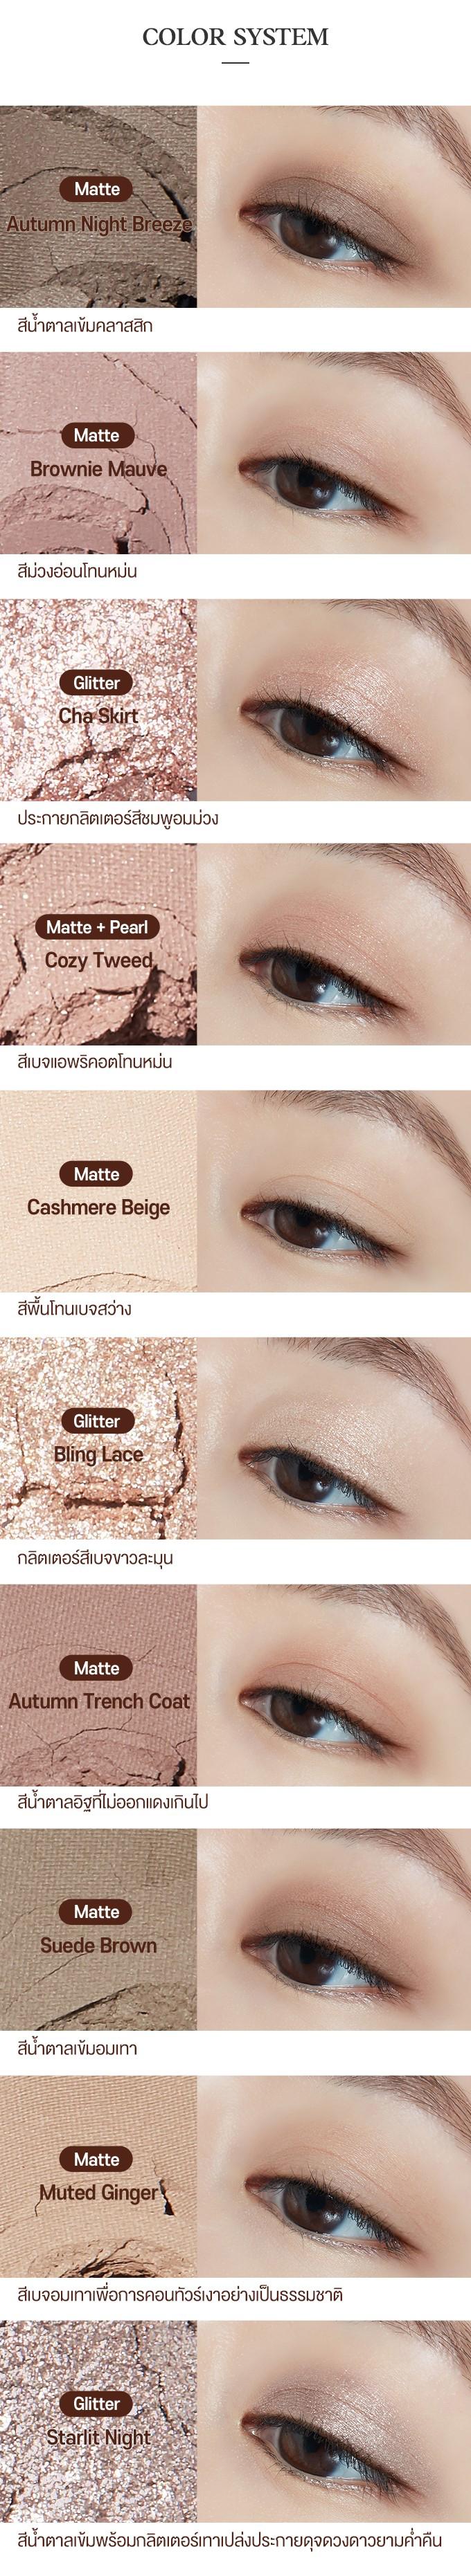 play_color_eyes_autumn_closet_TH_4